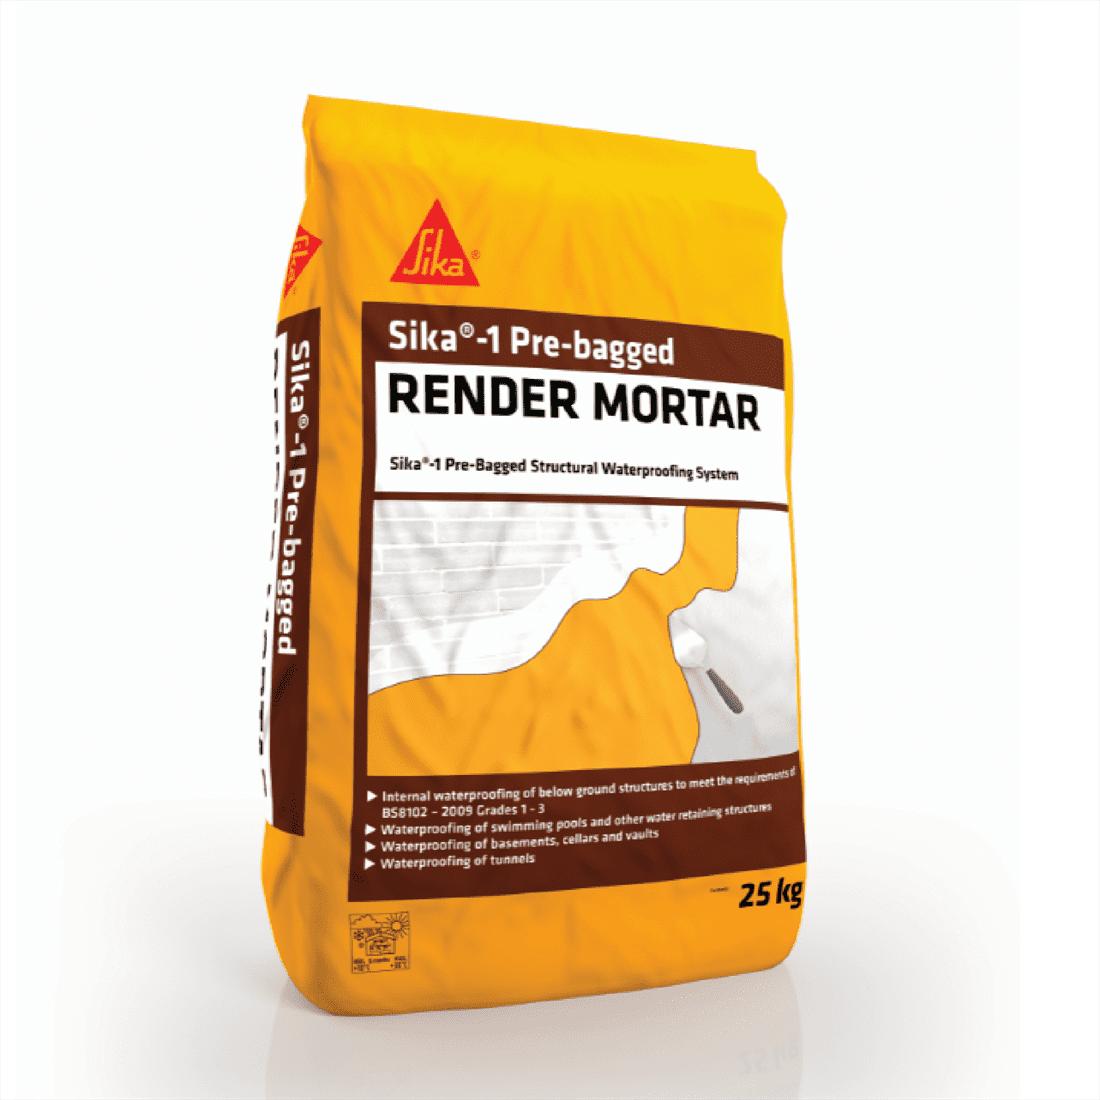 Sika 1 Pre Bagged Render Mortar